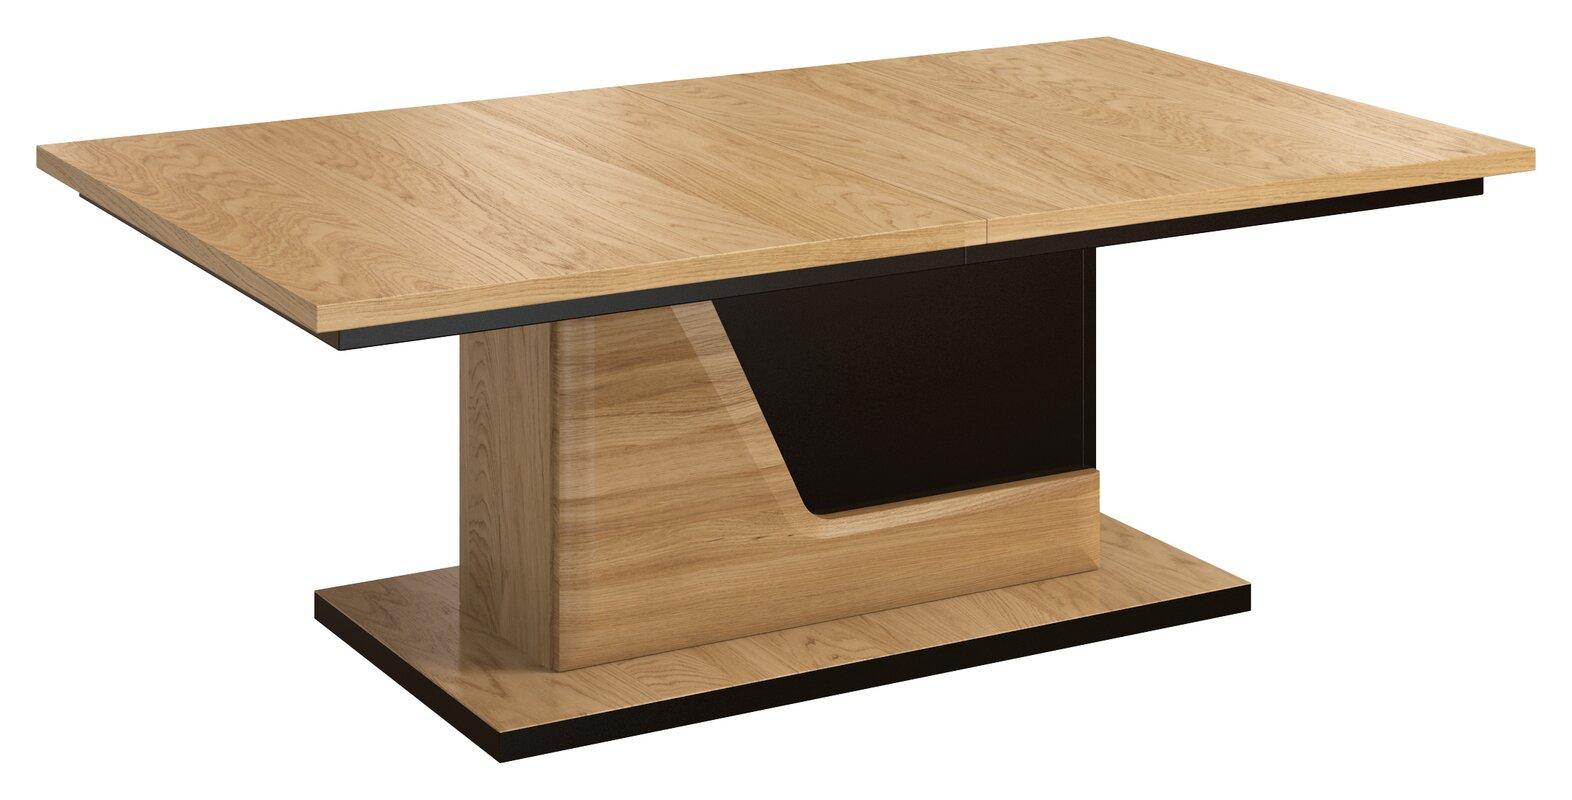 Mebin smart coffee table reviews wayfair smart coffee table geotapseo Choice Image